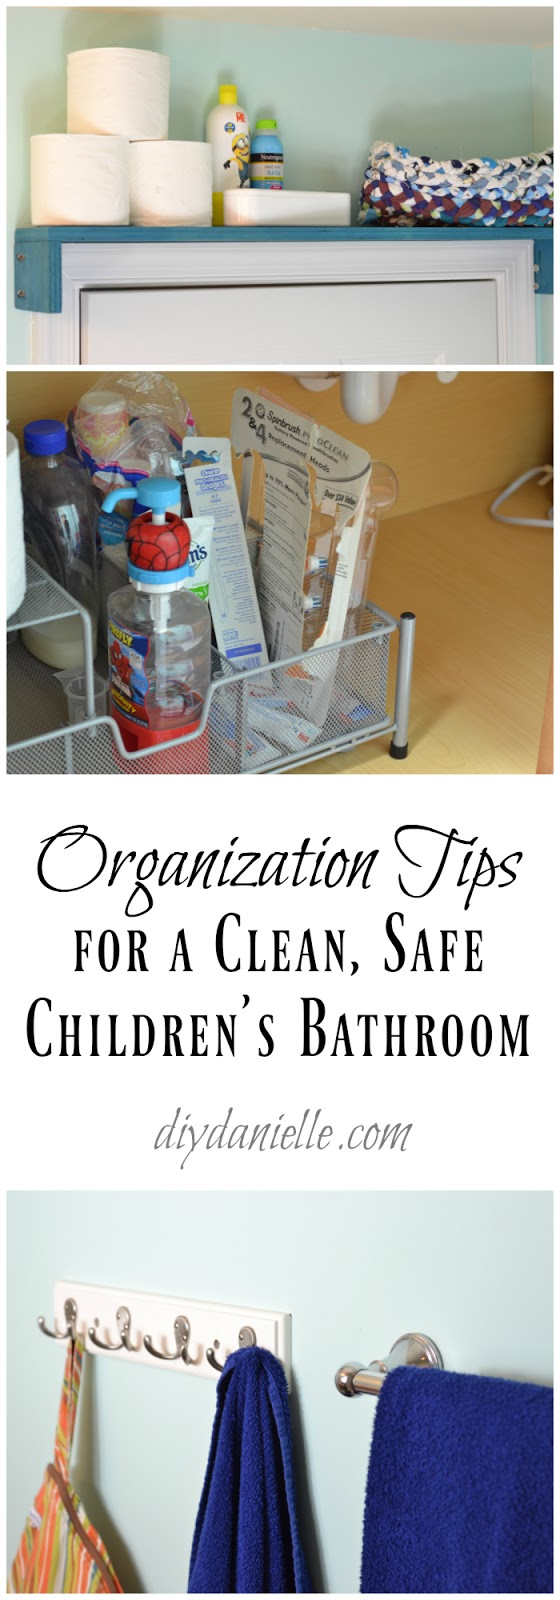 Tips to organize a children 39 s bathroom diy danielle for 5 bathroom safety tips